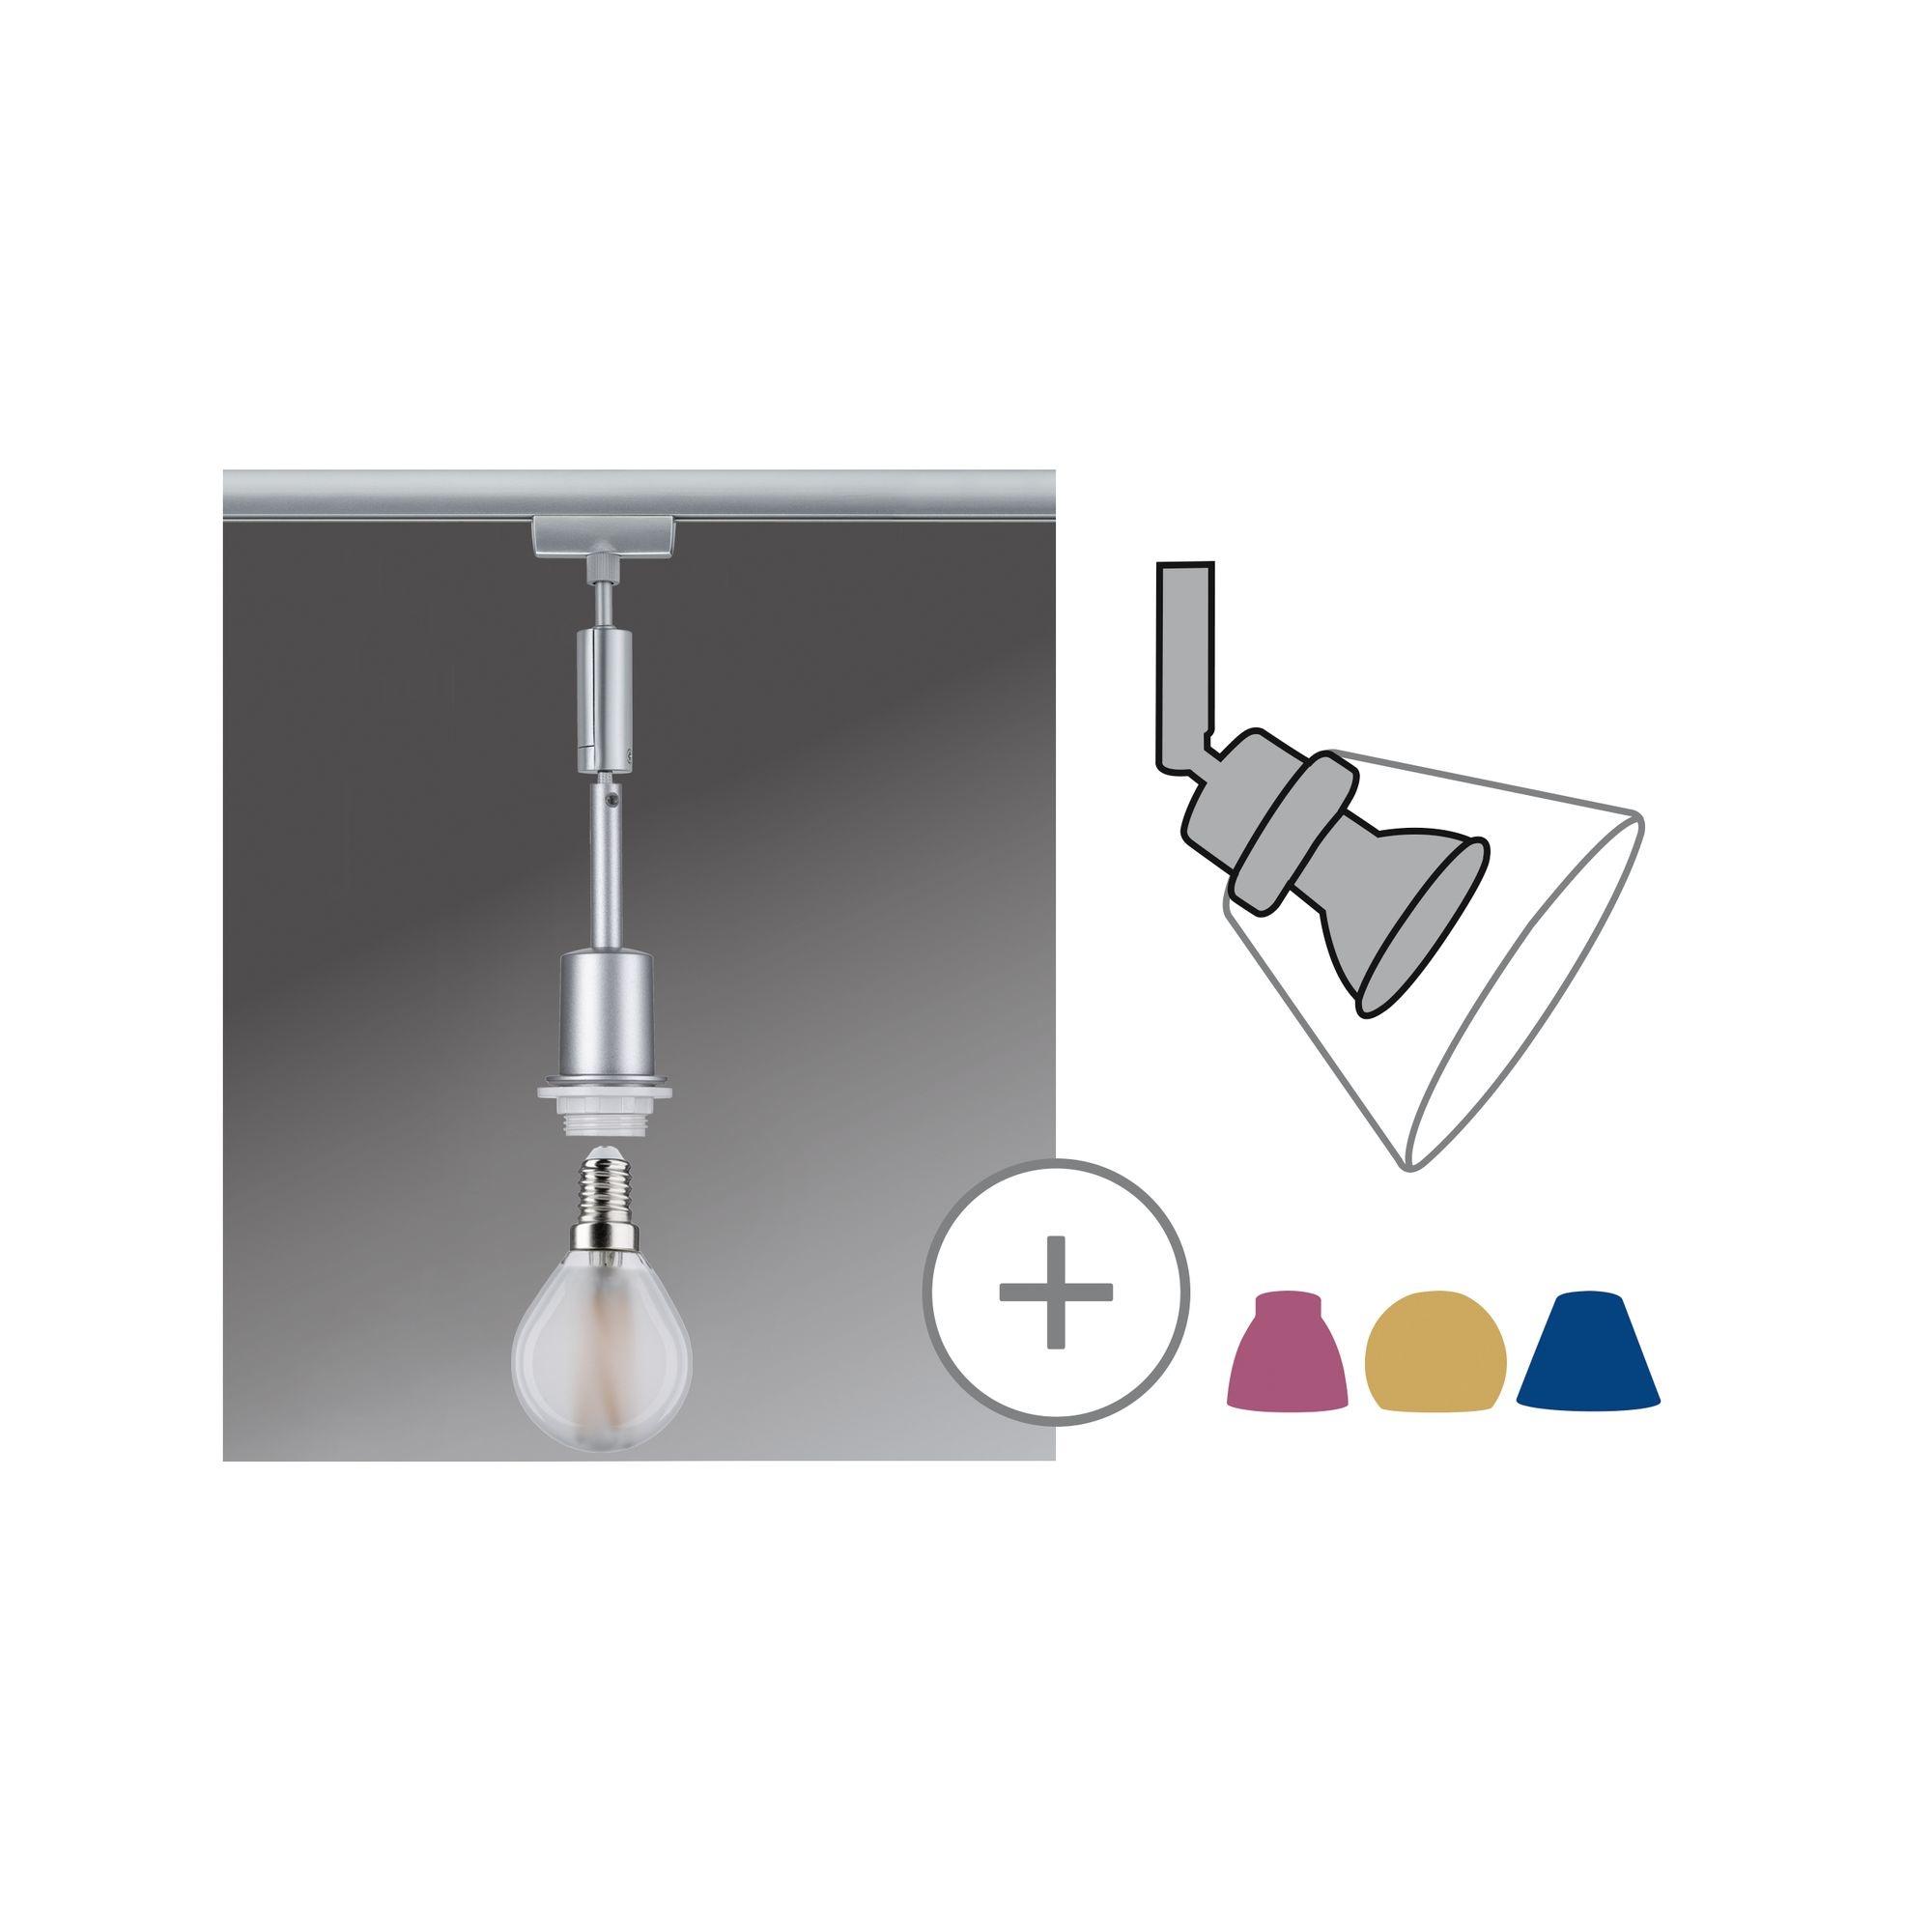 Paulmann URail DecoSystems Pendel Chrom matt max. 1x20W E14 ohne Leuchtmittel